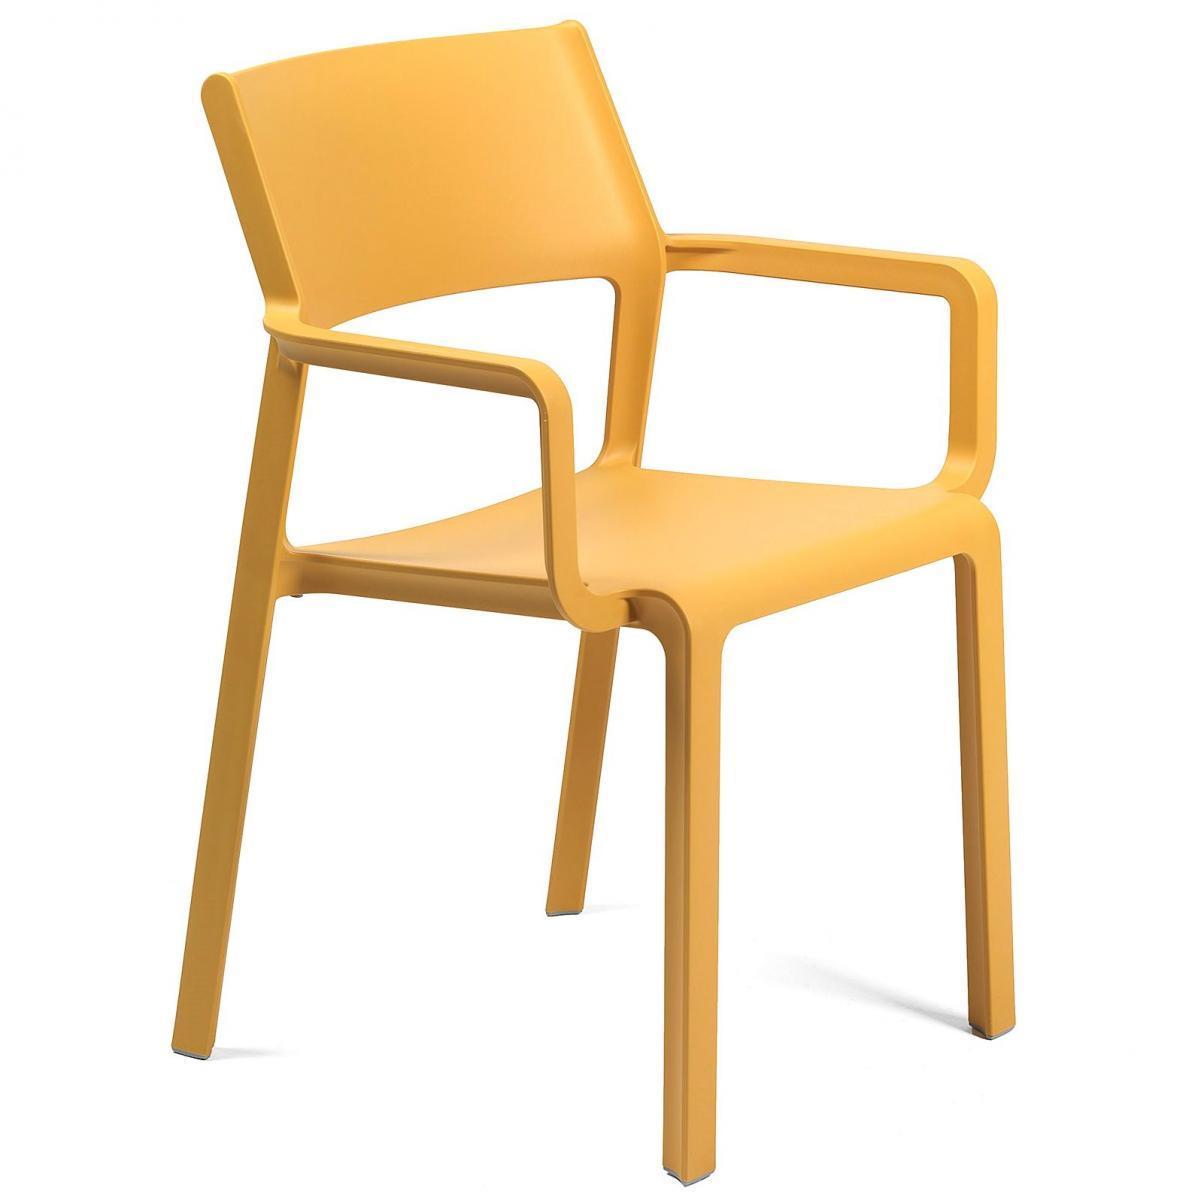 Кресло пластиковое Trill Armchair